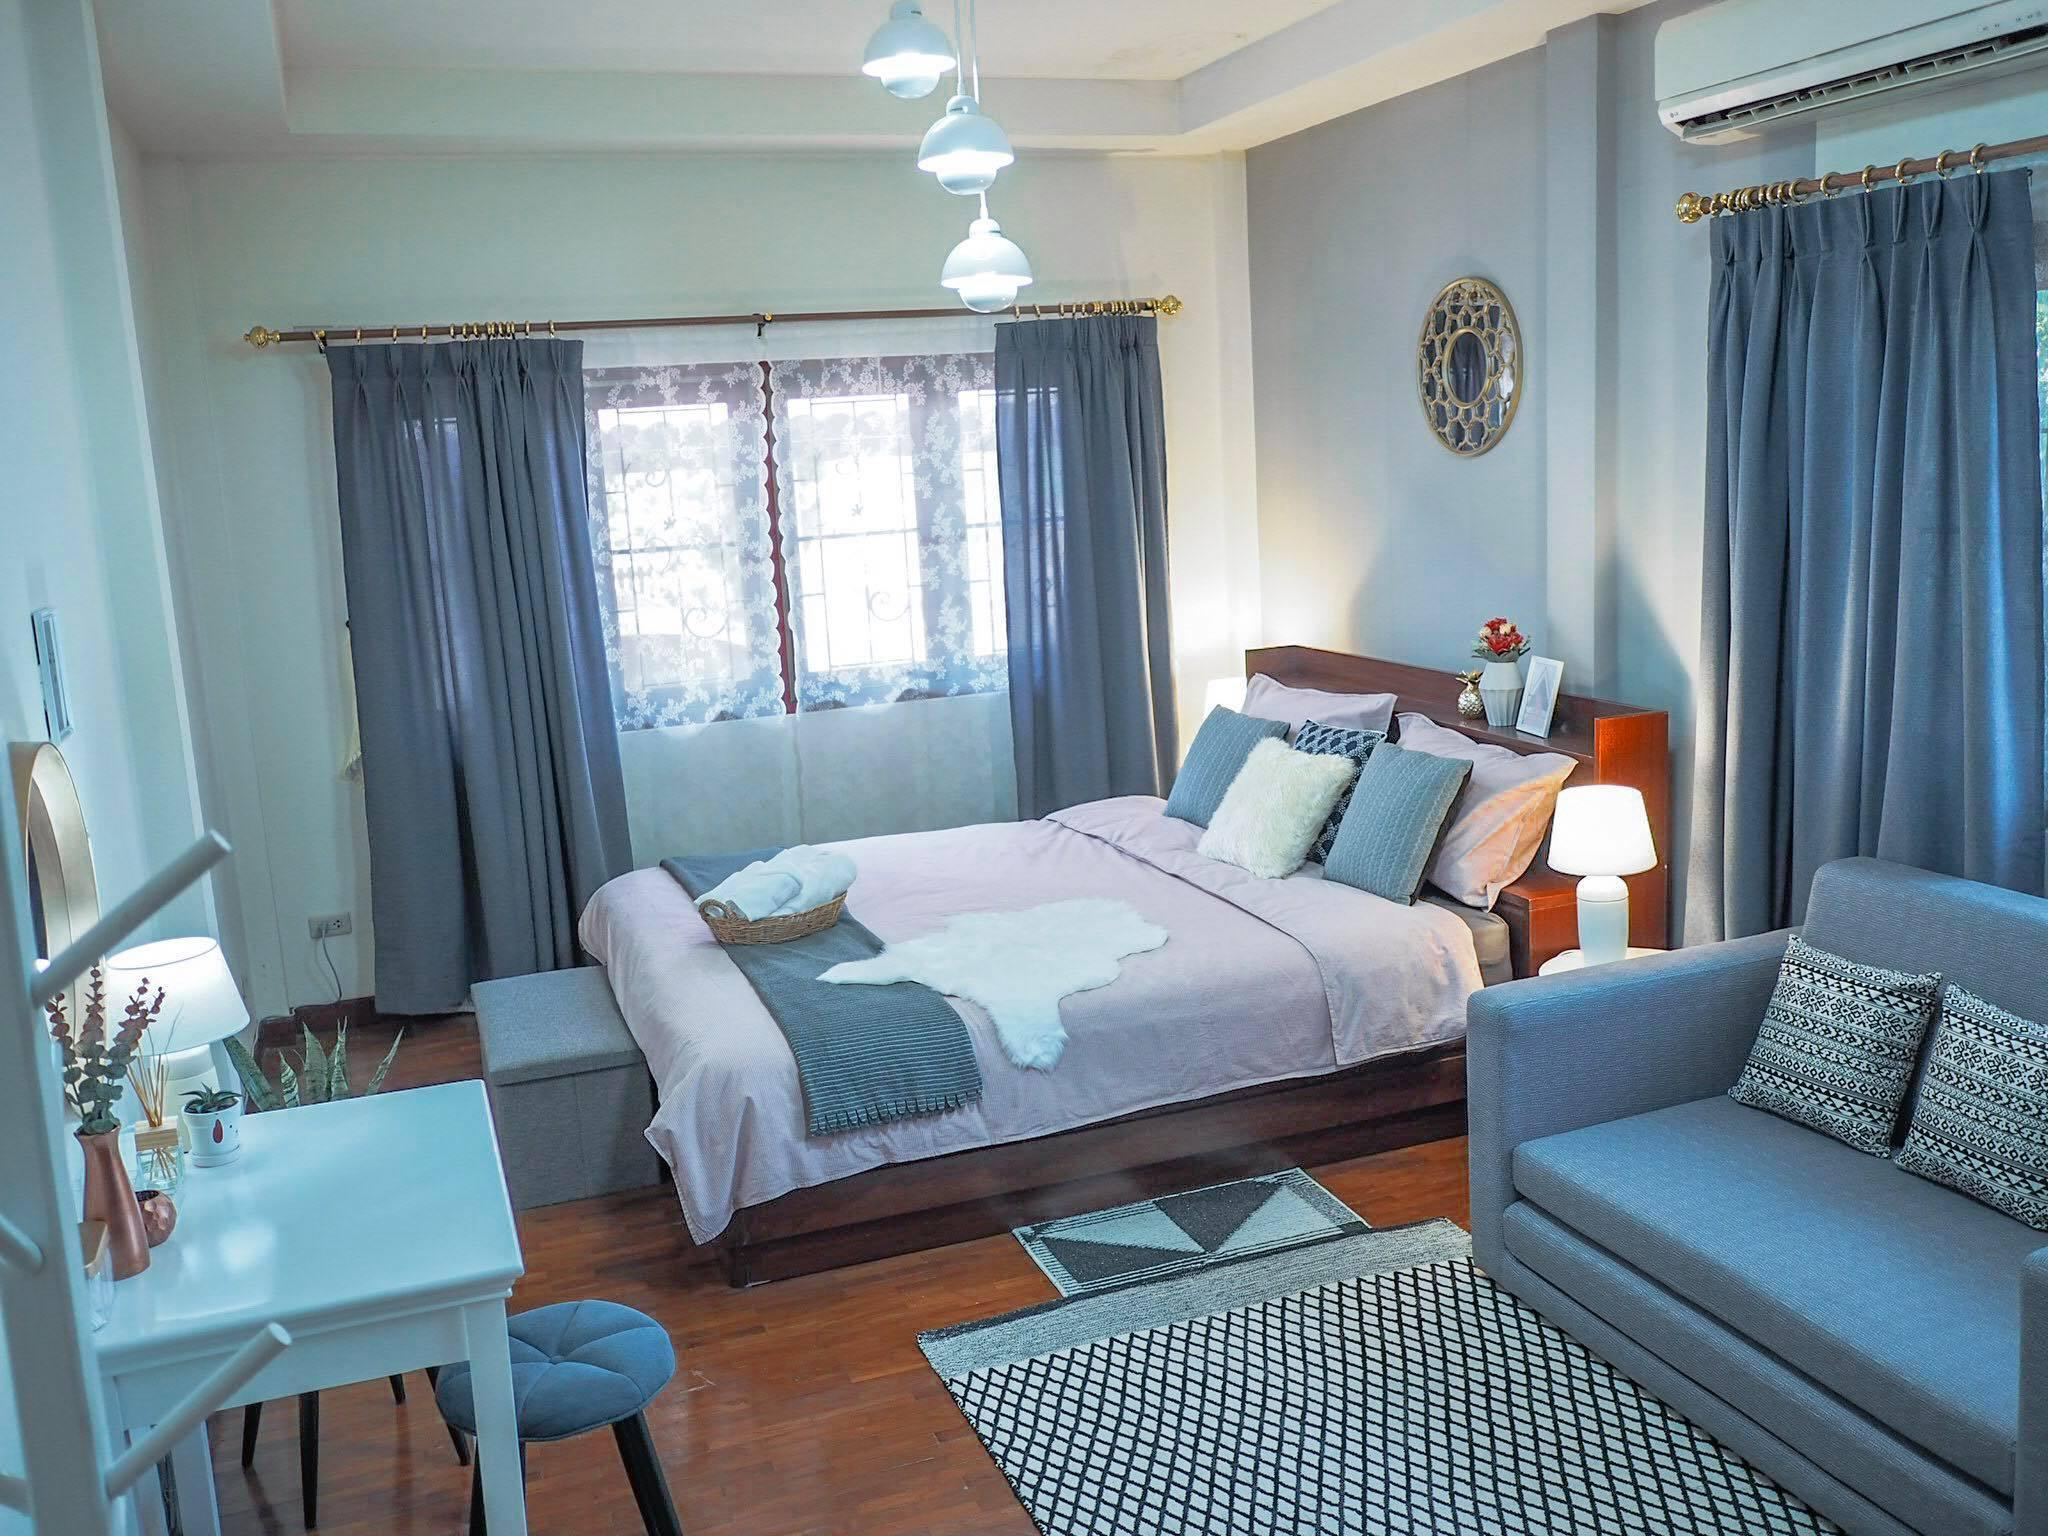 Wualai Sweet Home, near old city, free pick up บ้านเดี่ยว 3 ห้องนอน 2 ห้องน้ำส่วนตัว ขนาด 150 ตร.ม. – วัวลาย